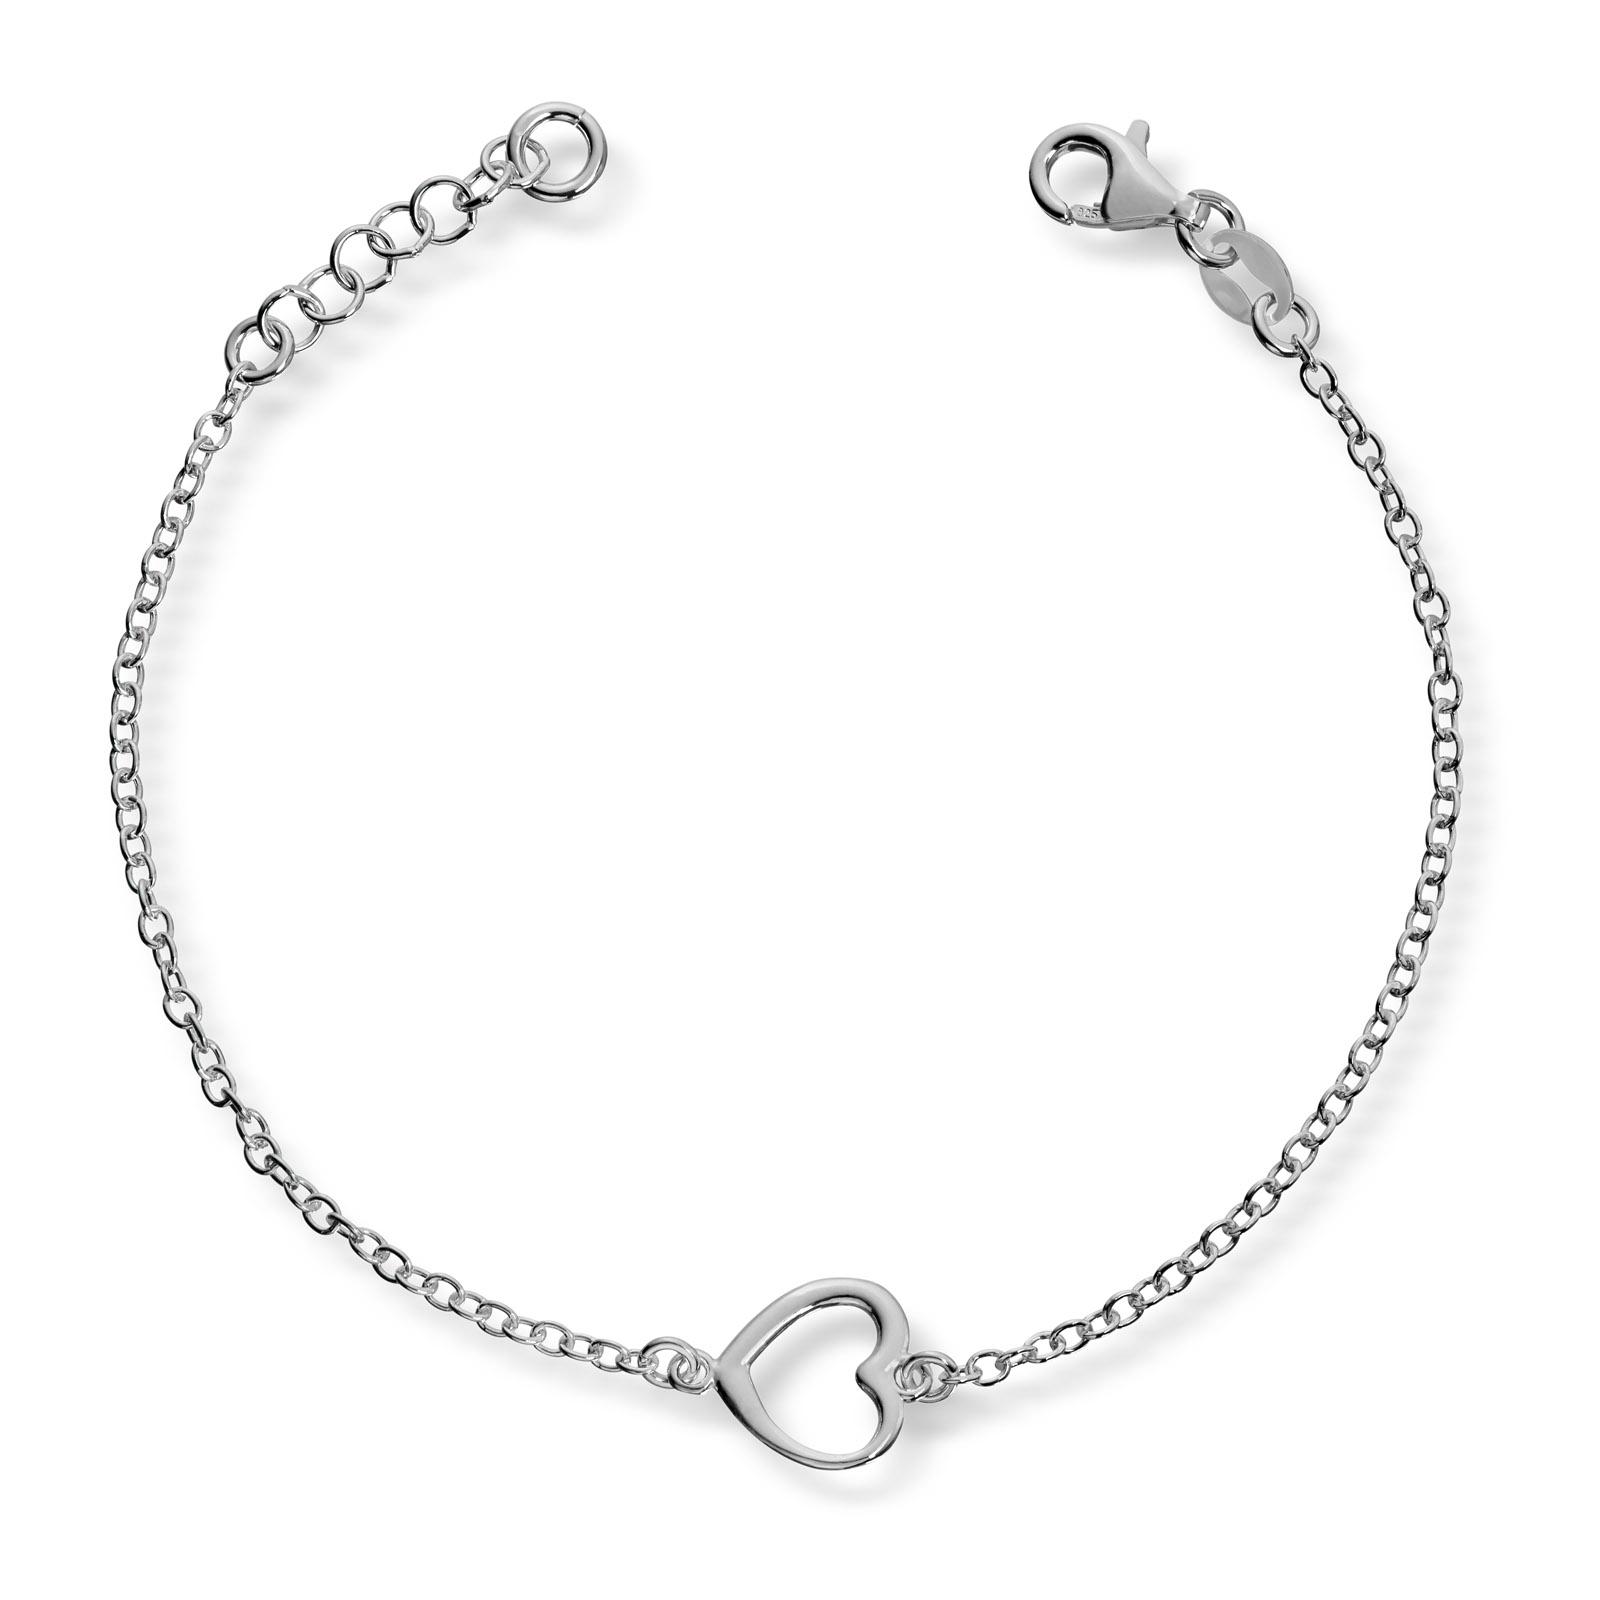 Mestergull Delikat armbånd med hjerte i sølv MG BASIC Armbånd